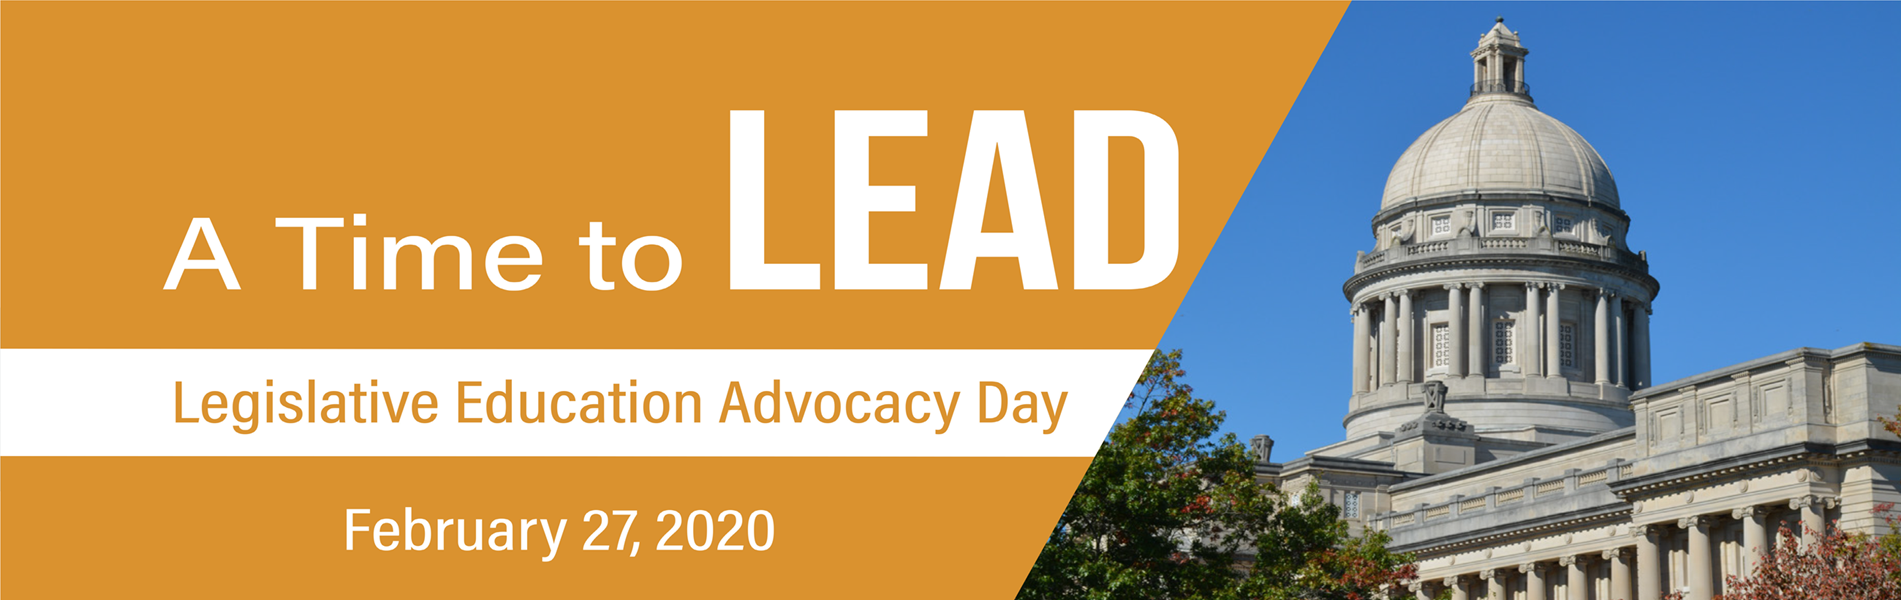 Legislative Education Advocacy Day 2020